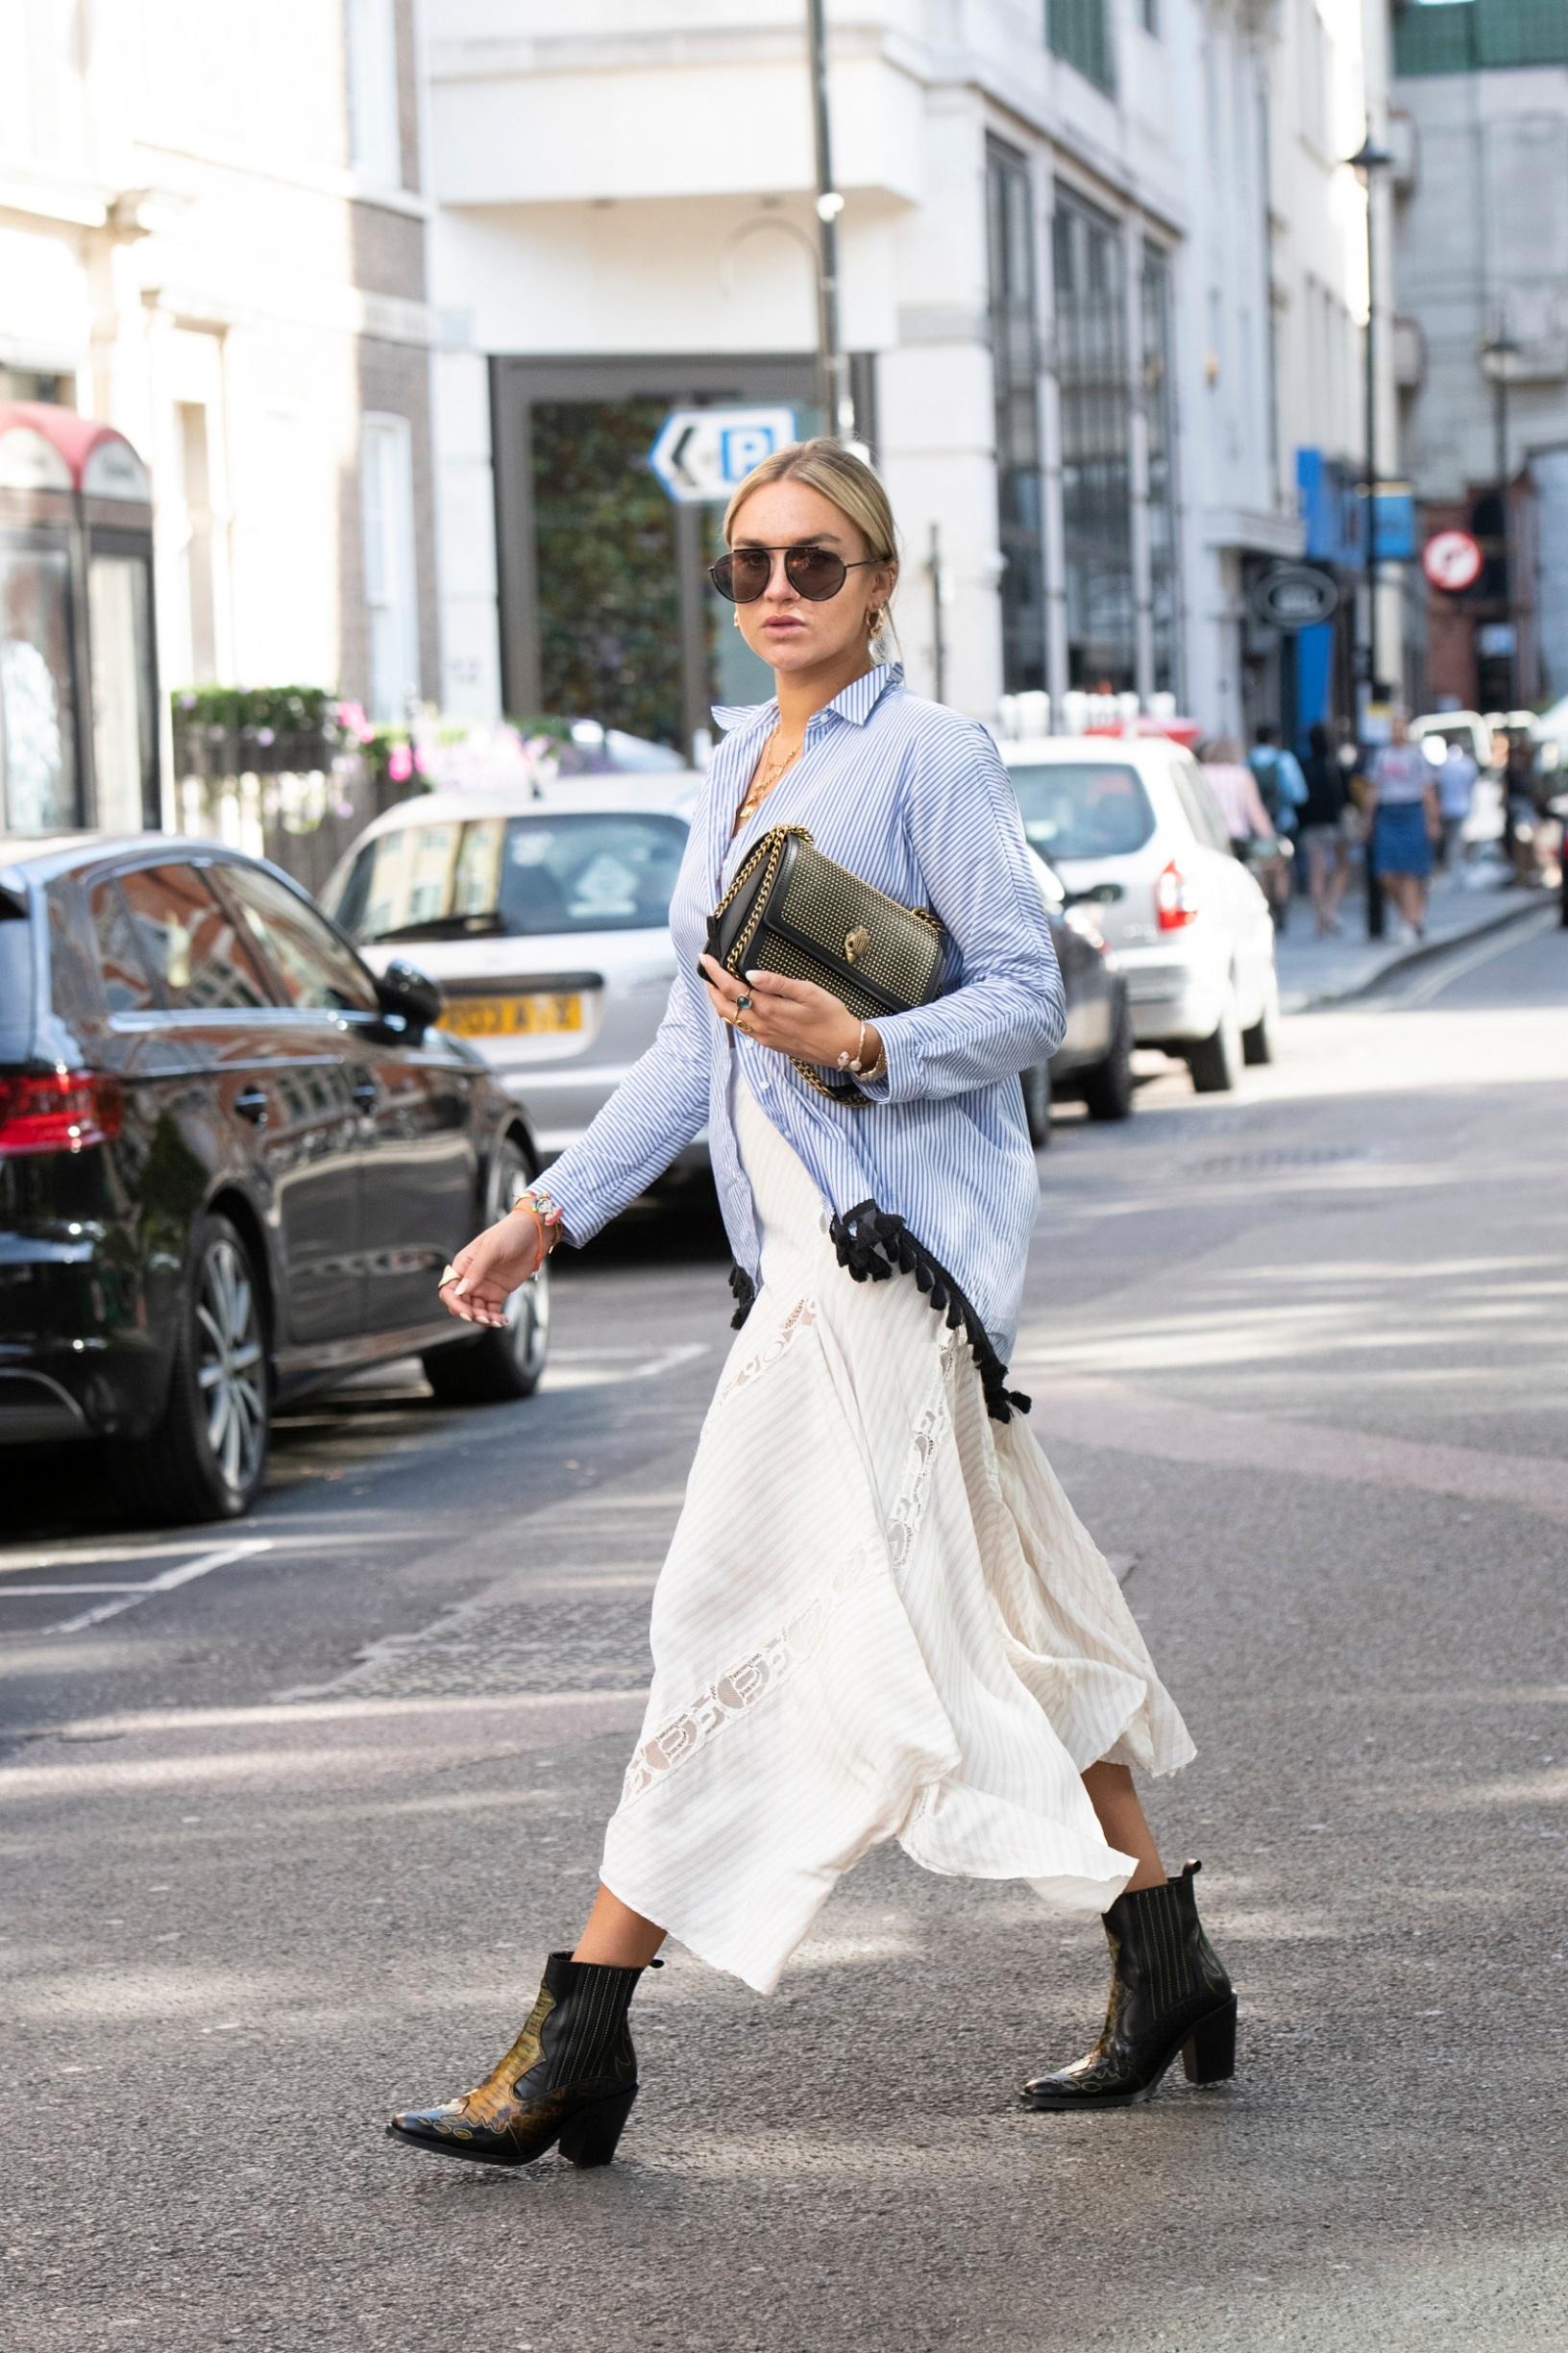 LONDON, ENGLAND - SEPTEMBER 15: Nina Suess wears a Zara shirt, Givenchy sunglasses, Chloe skirt, Kurt Geiger boots and bag on September 15, 2019 in London, England. (Photo by Kirstin Sinclair/Getty Images for Kurt Geiger)